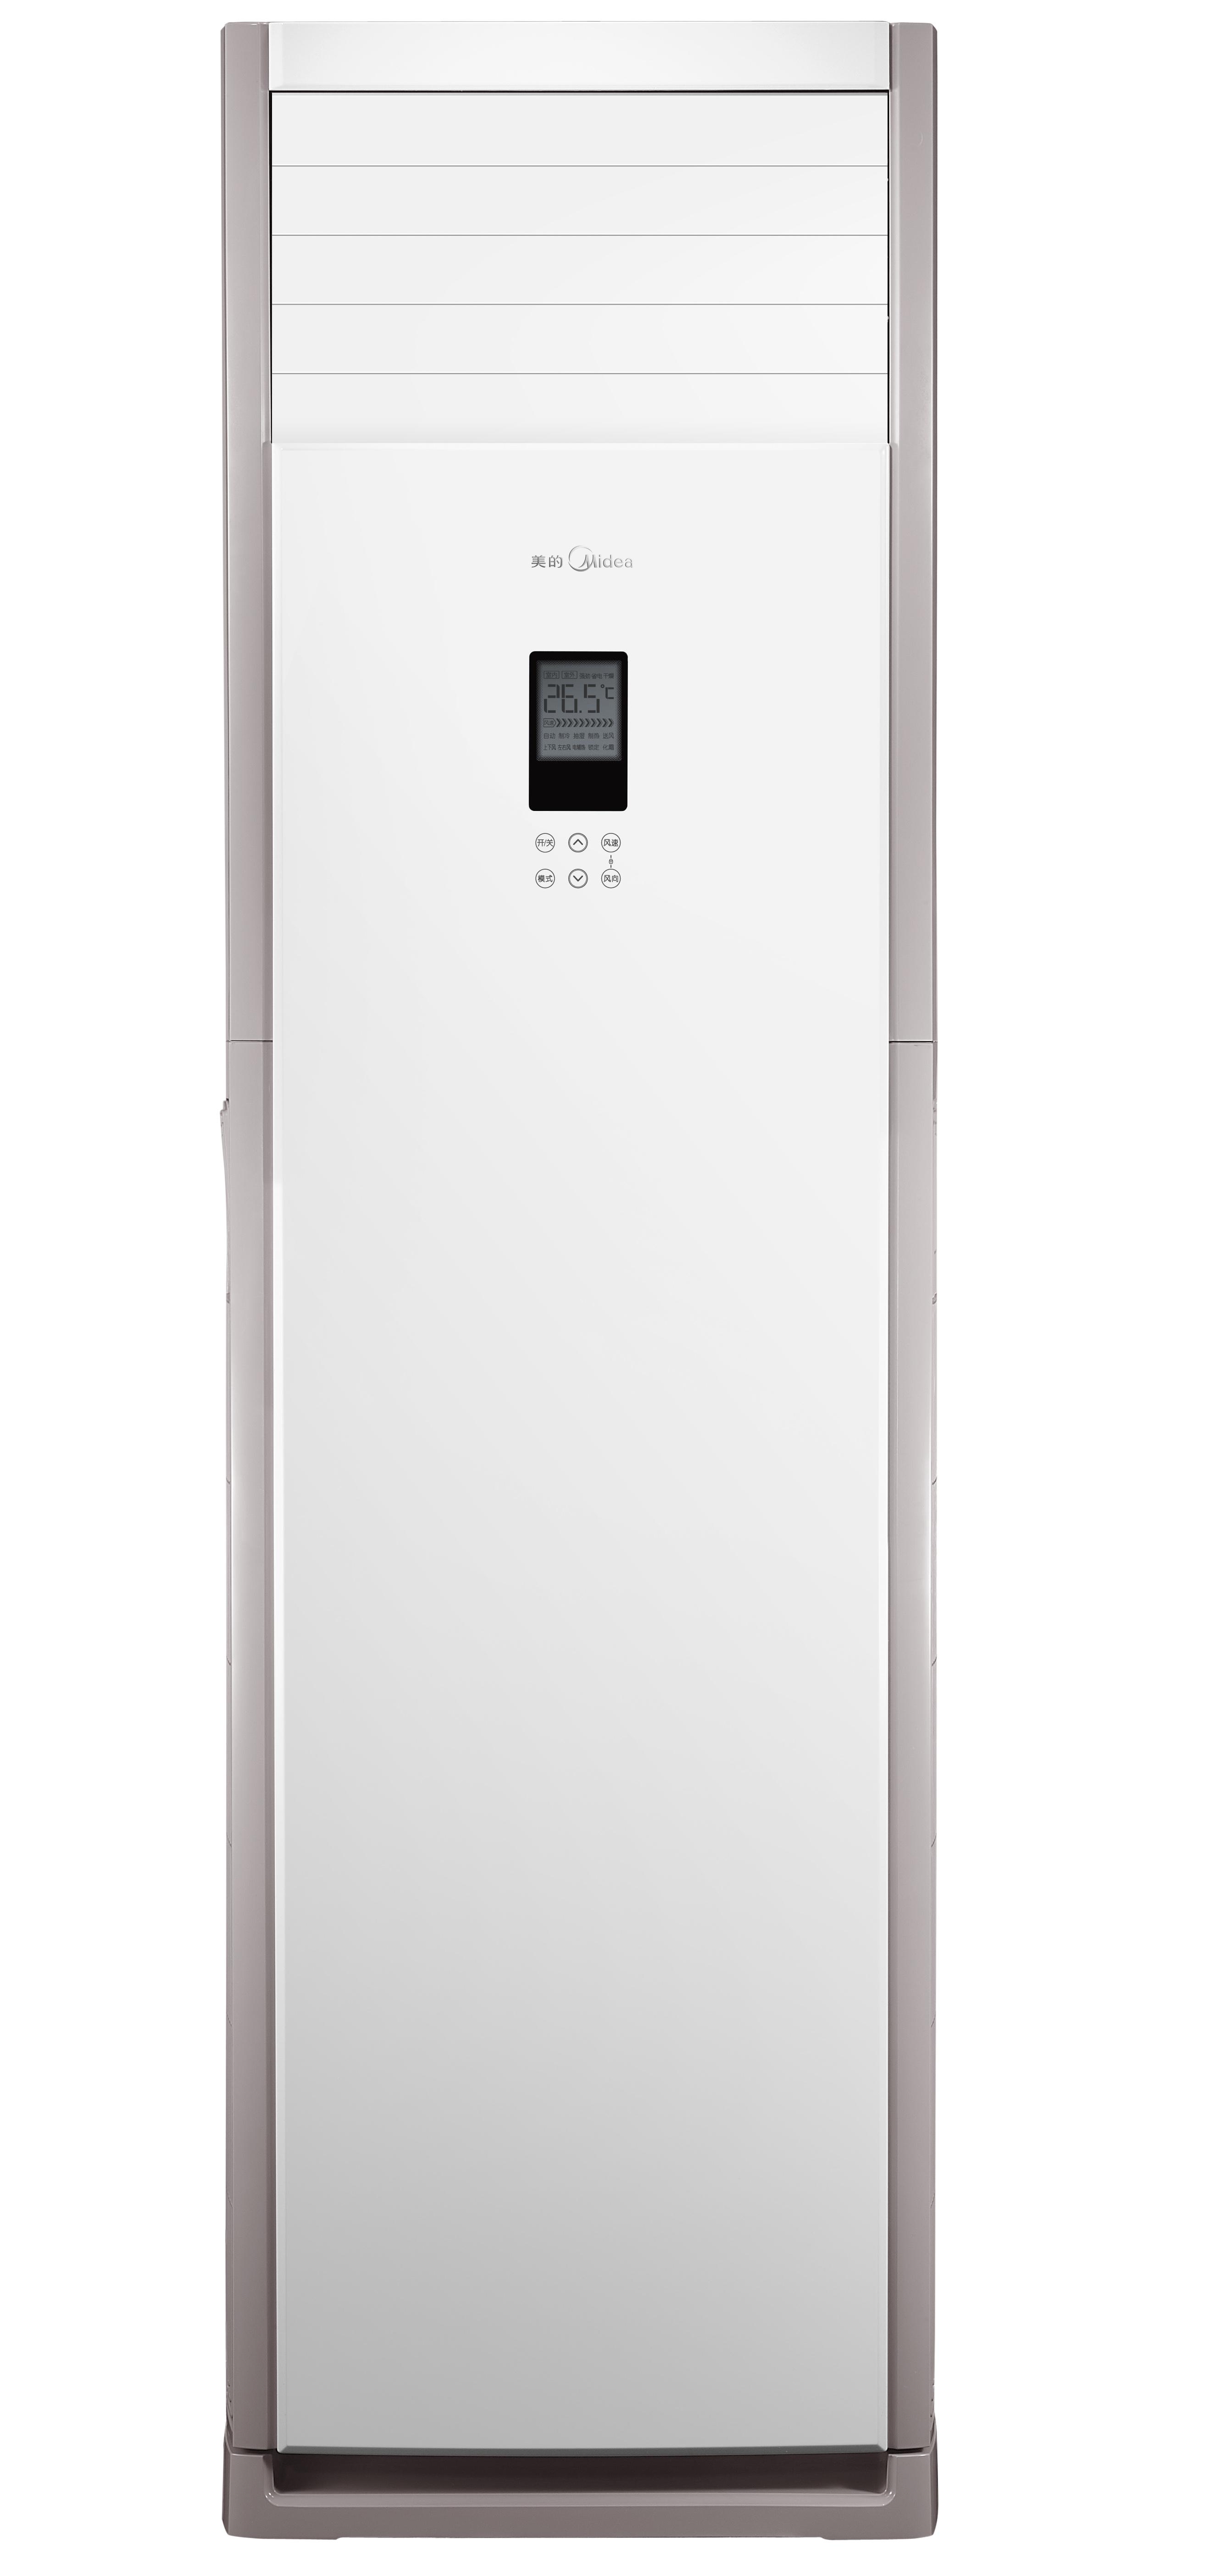 Midea/美的 KFR-120LW/SDY-PA400(R3)家用空调套机 说明书.pdf